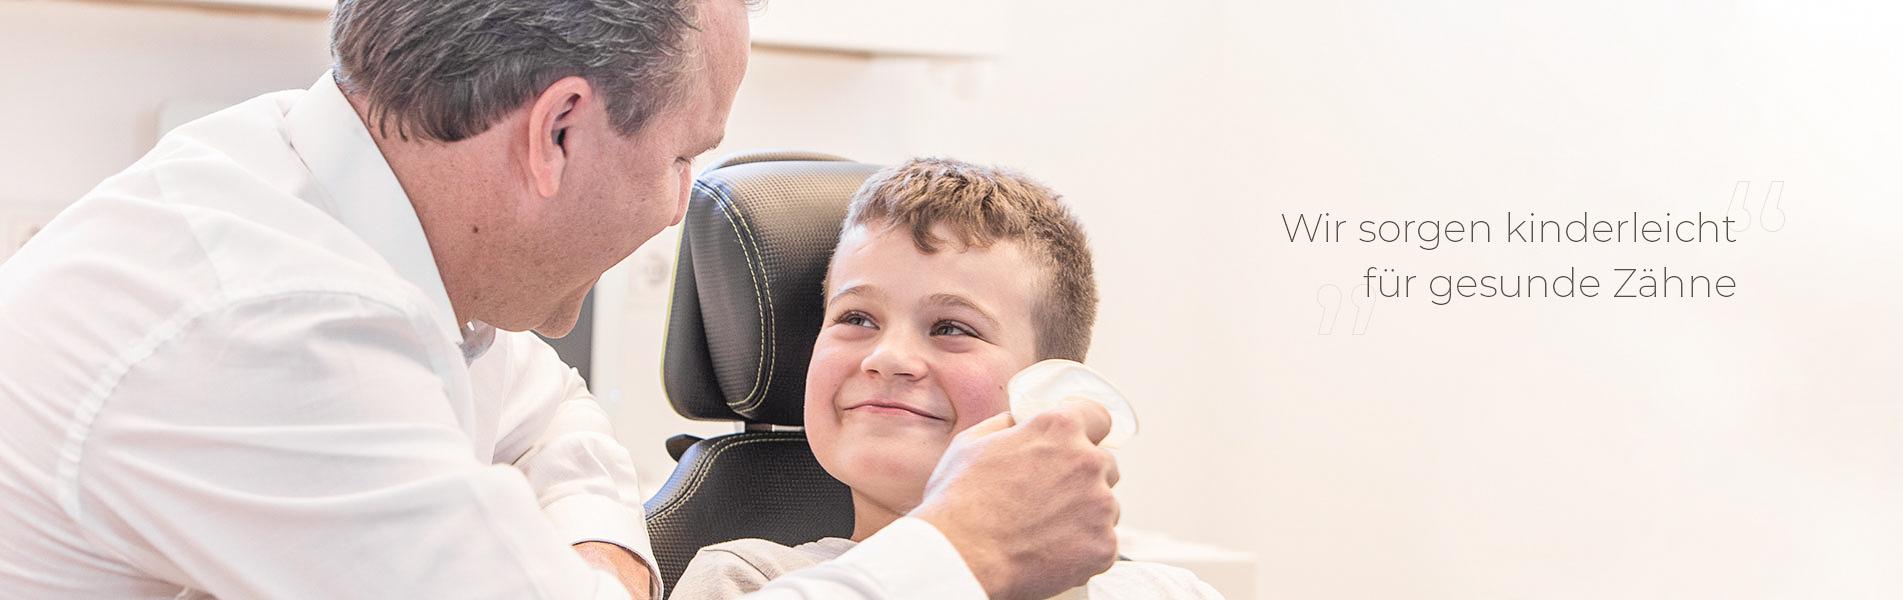 Kinderzahnmedizin- Zahnarztpraxis Dr. Tolk + Team in Kreuzau bei Düren